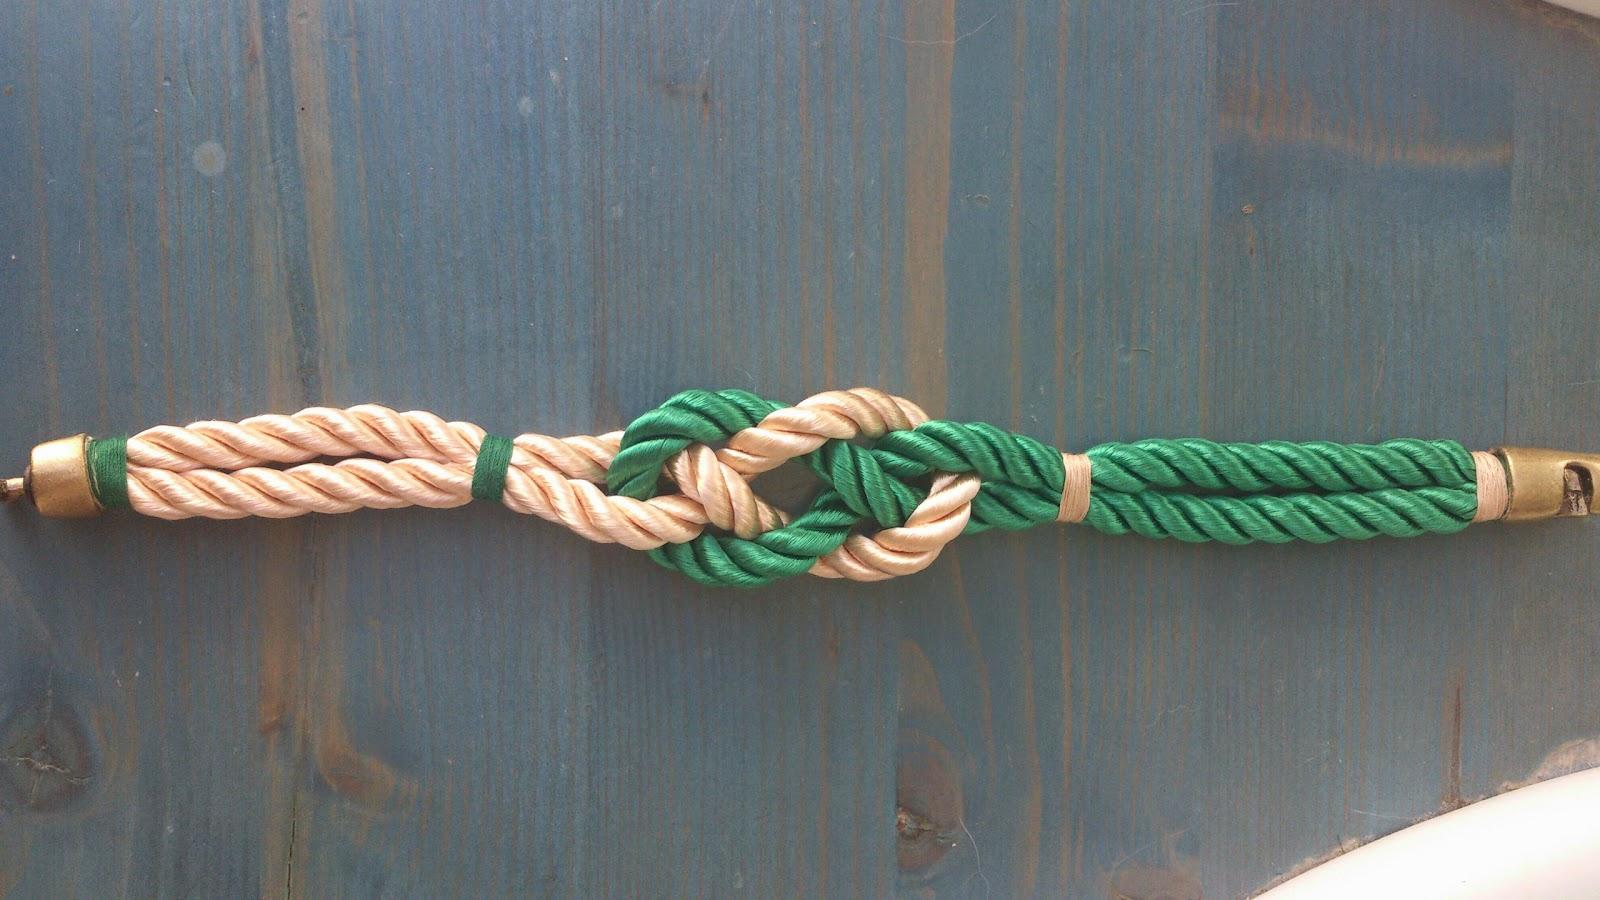 Klettissimo pulsera para caballero nudo marinero - Nudos marineros para pulseras ...